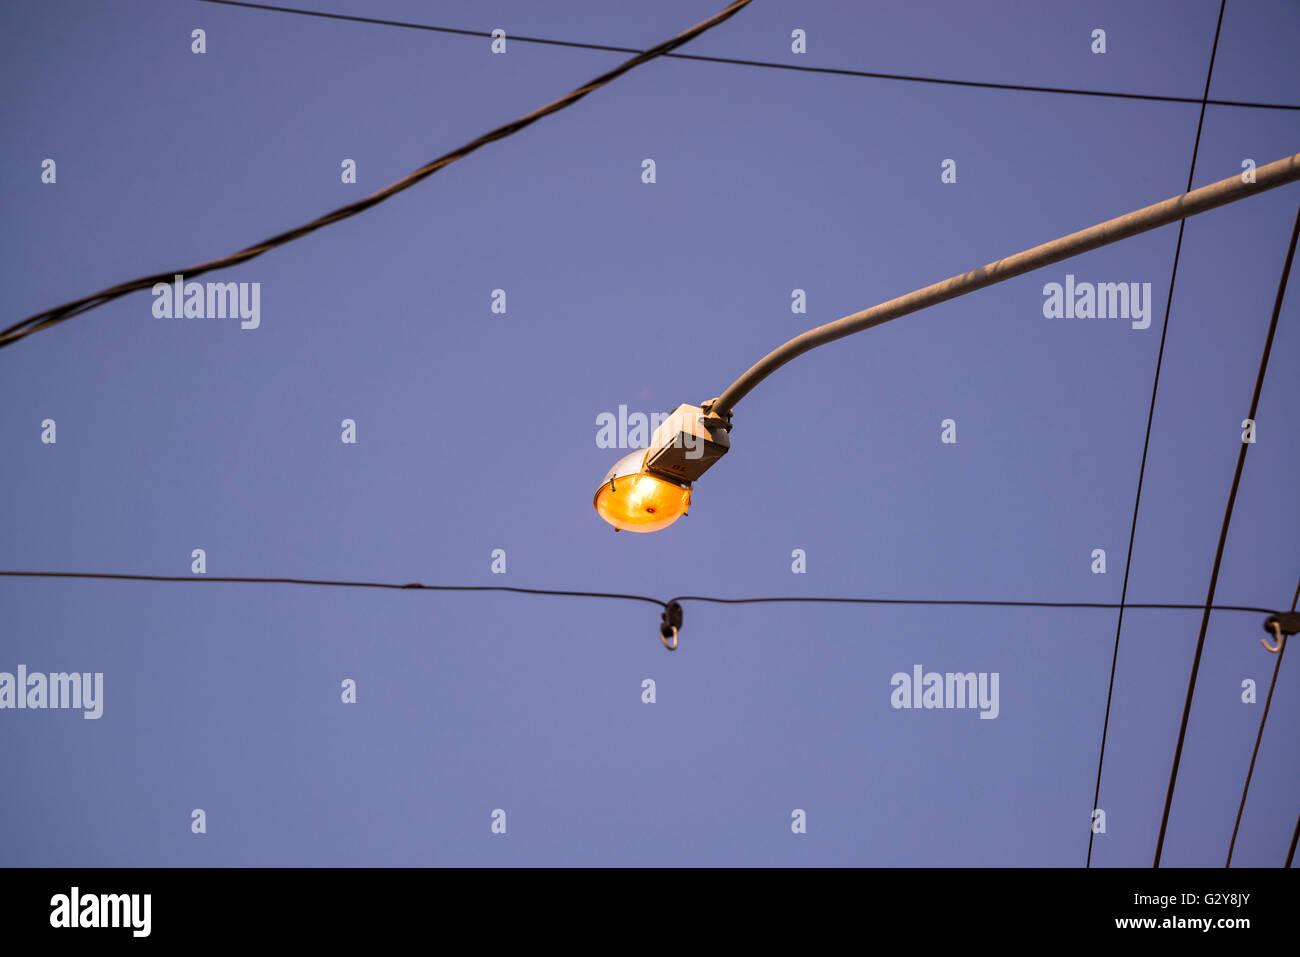 Lit street lamp in daylight - Stock Image